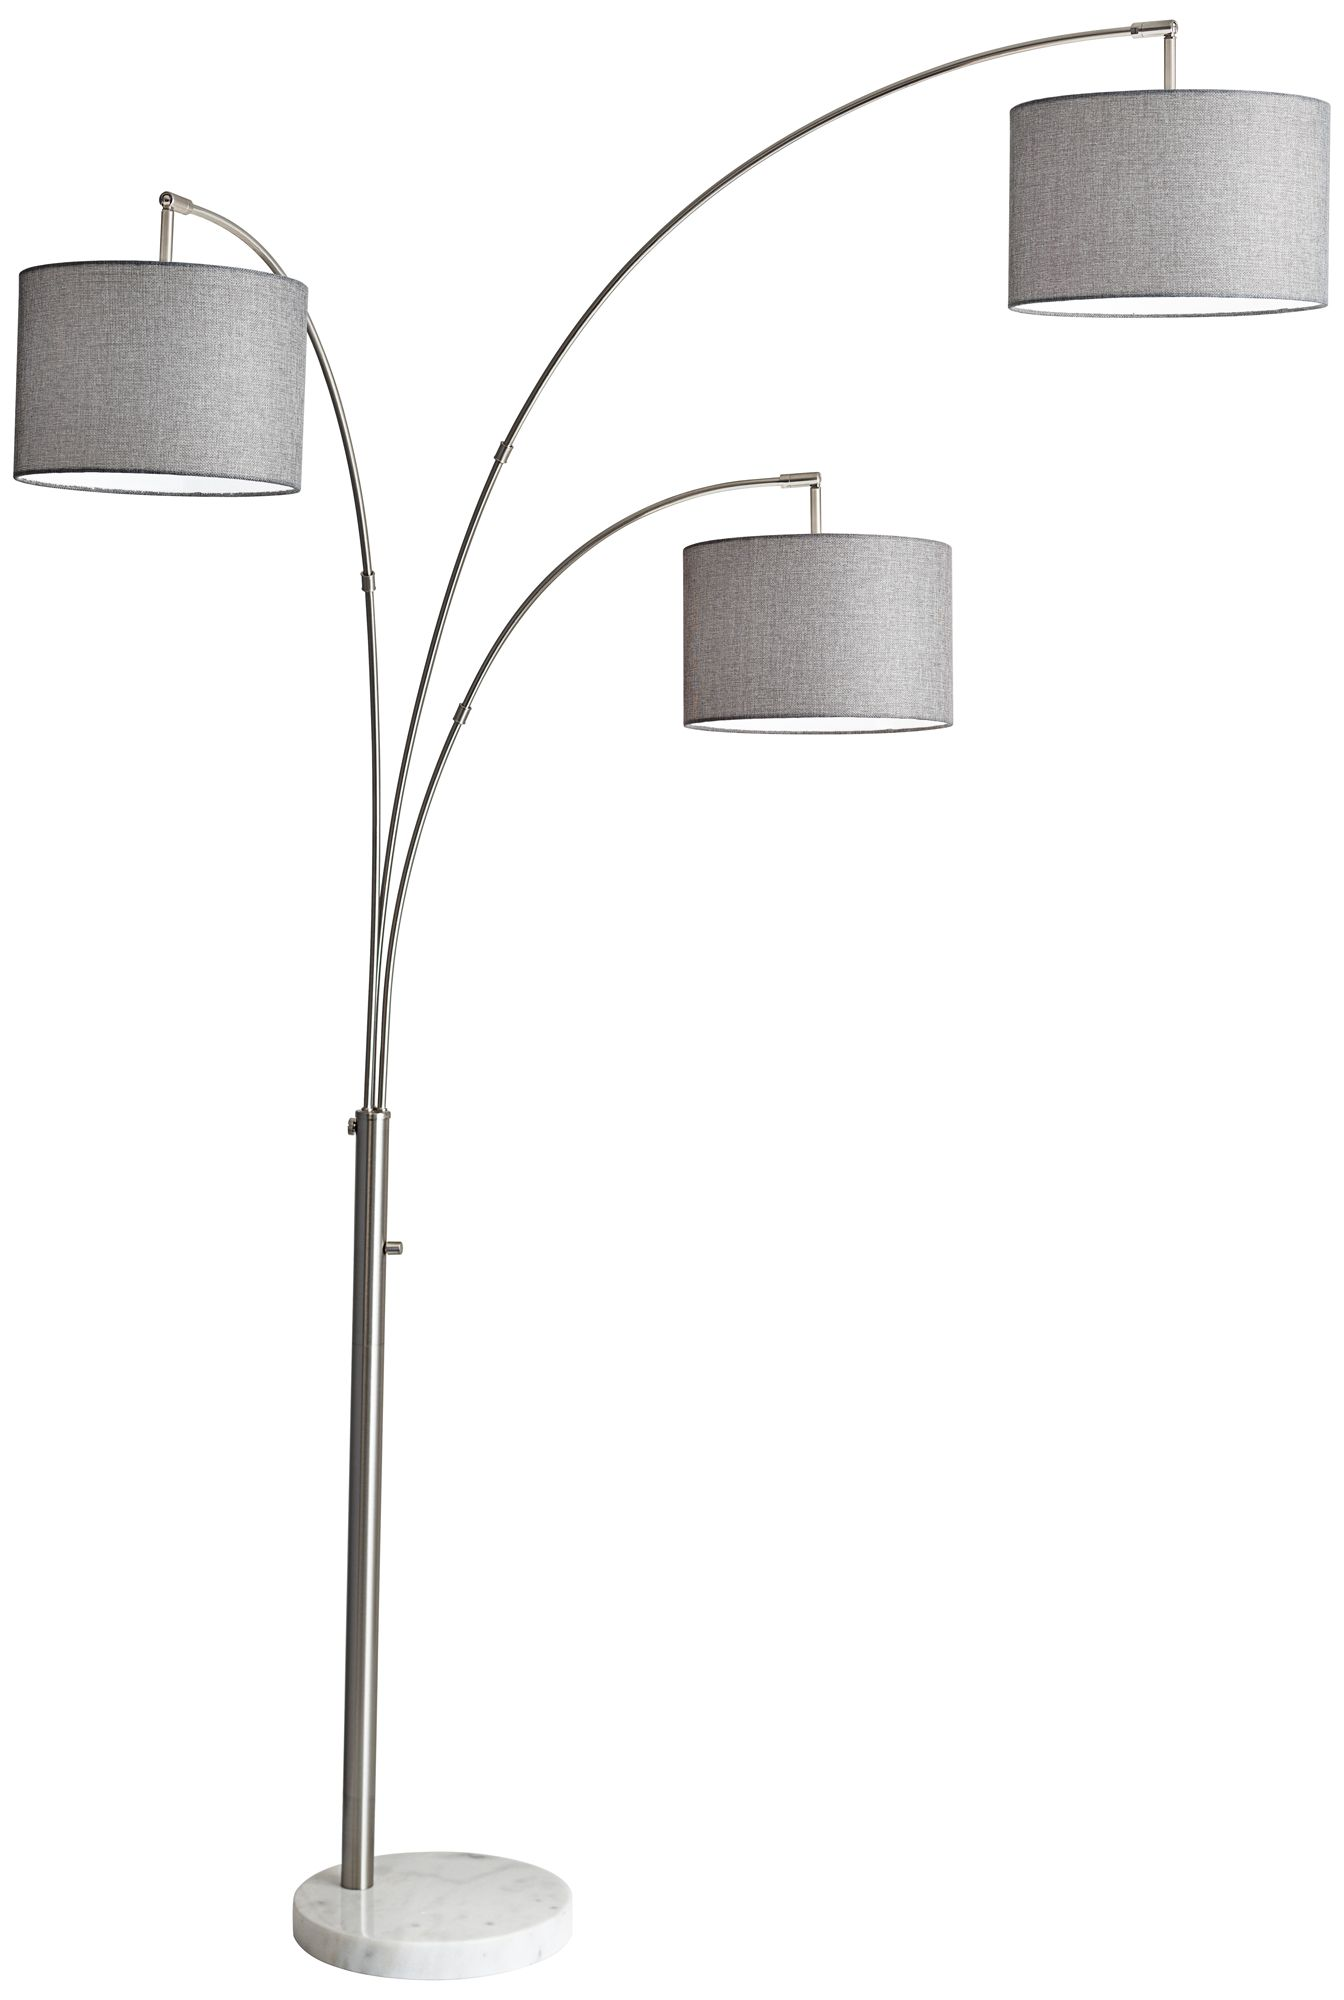 Bowery Brushed Steel Adjustable 3 Arm Arc Floor Lamp   #12W15 | Lamps Plus